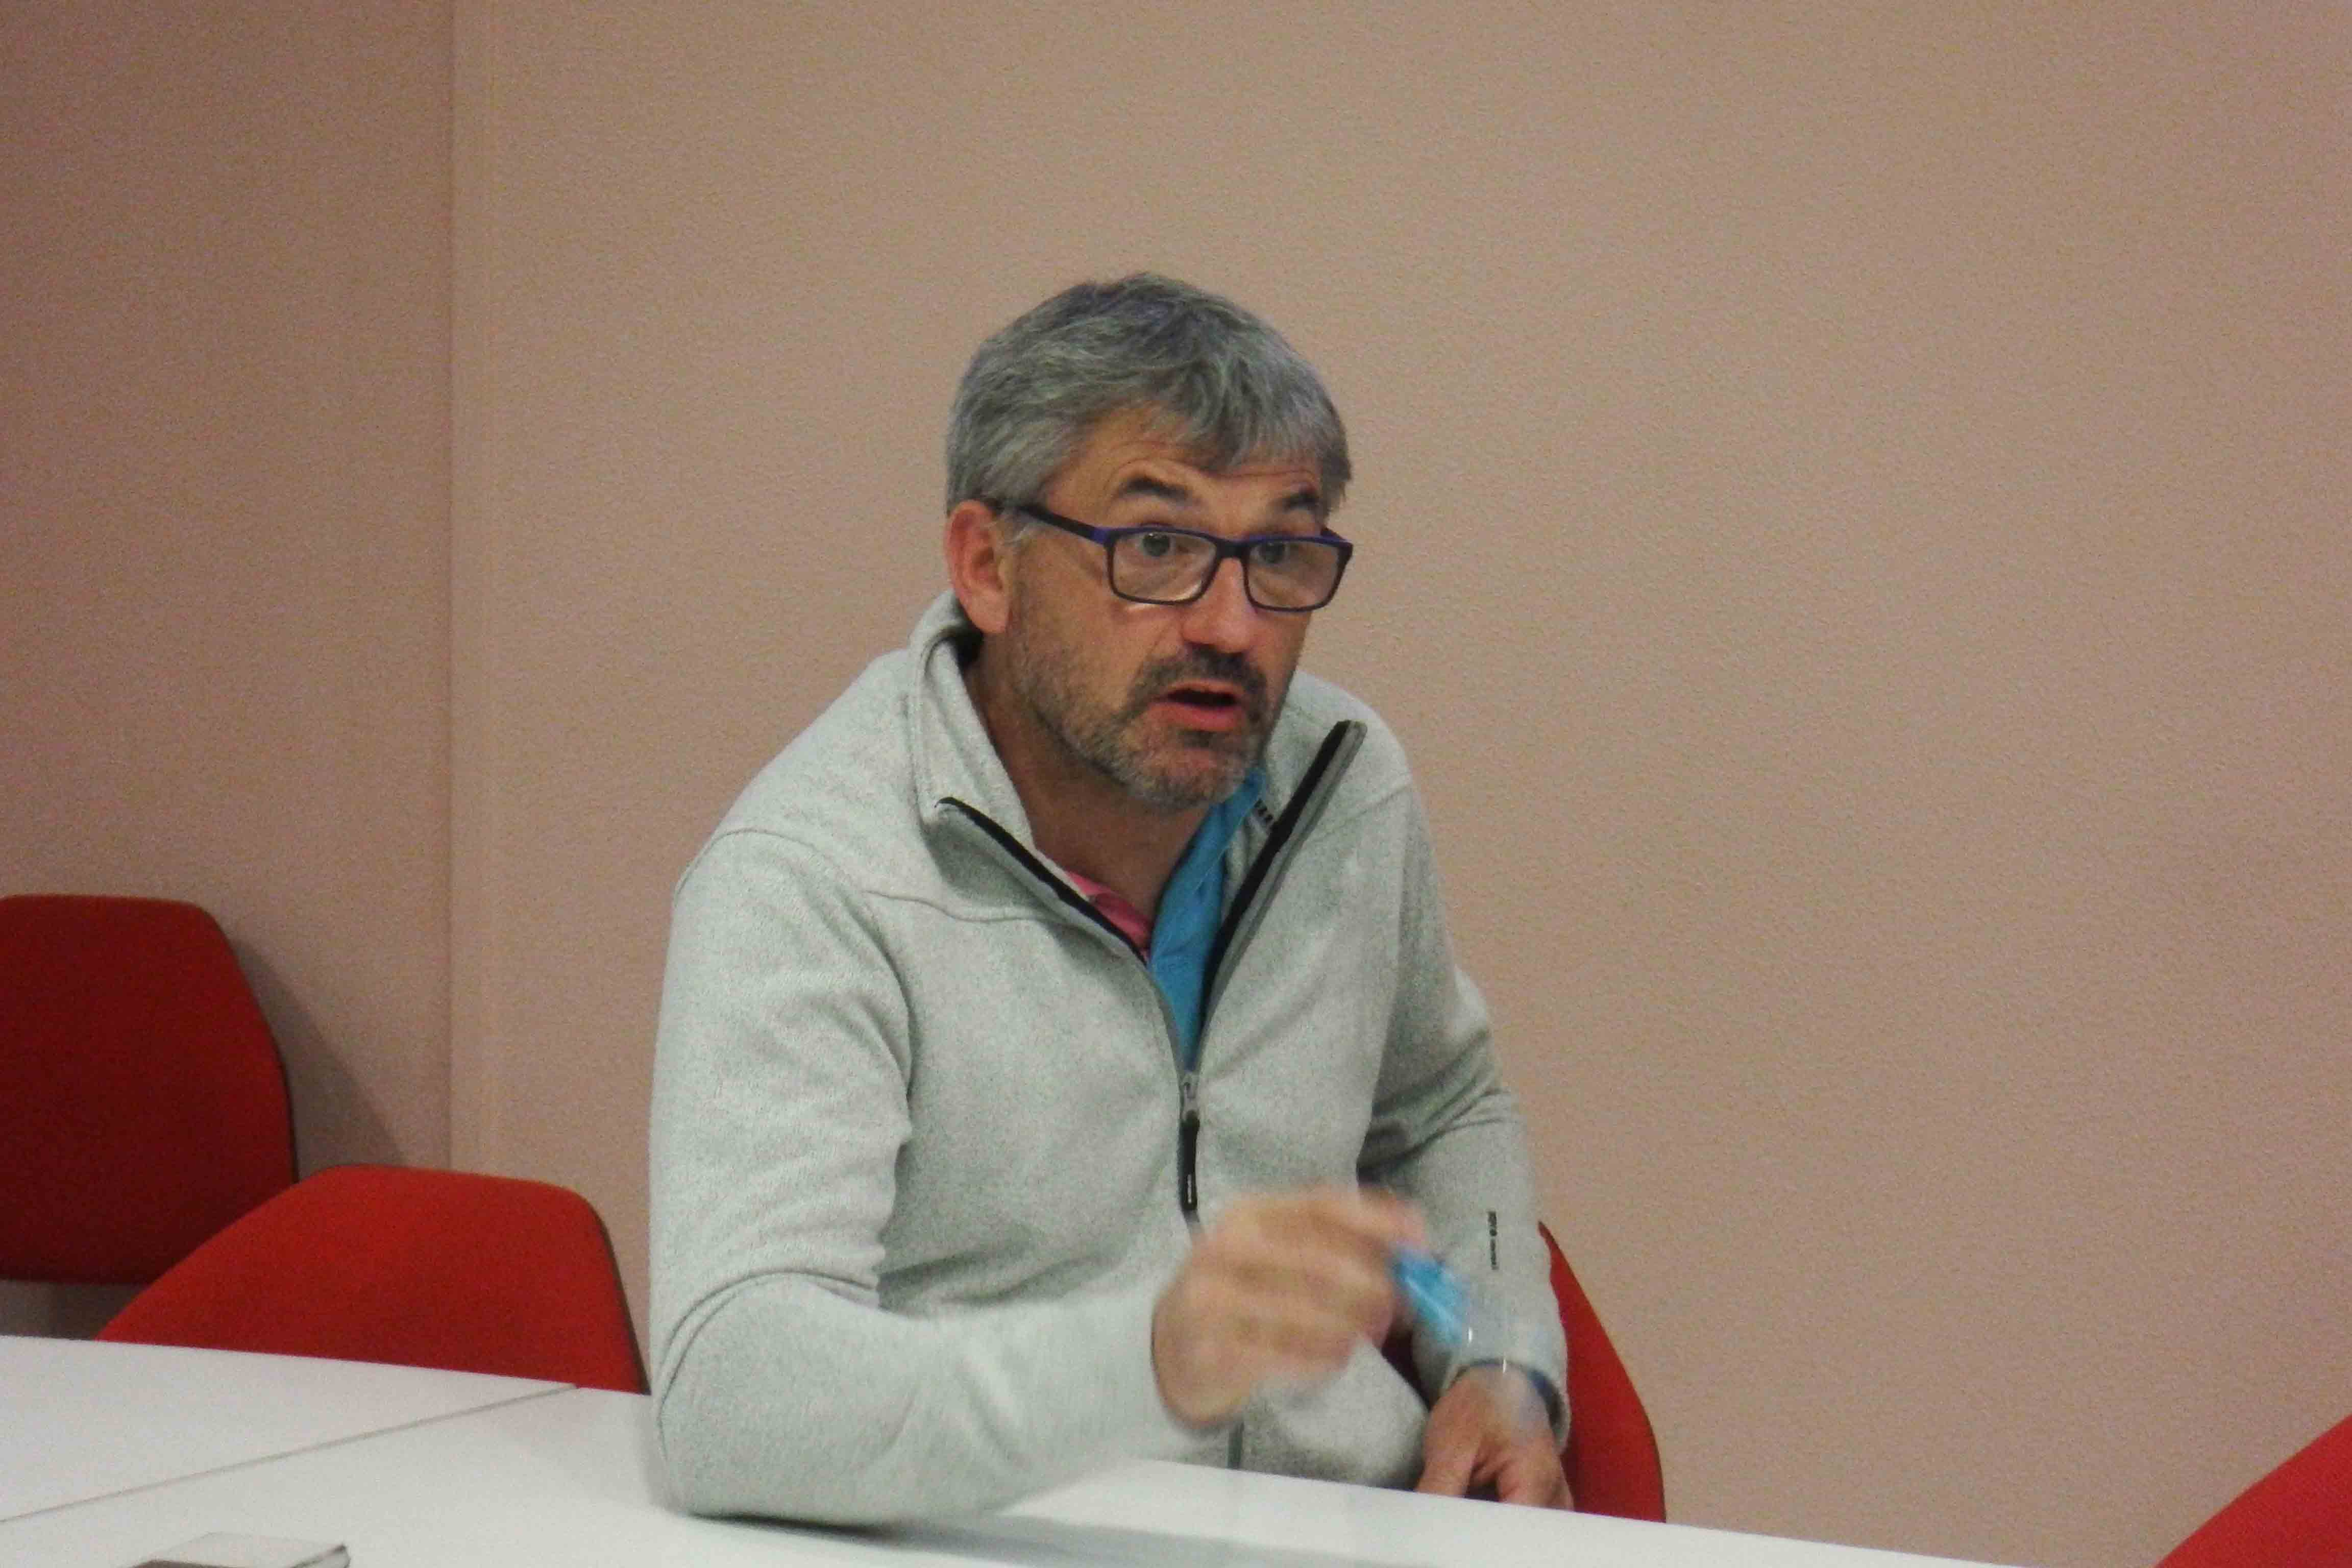 Jean-Paul Vaginay